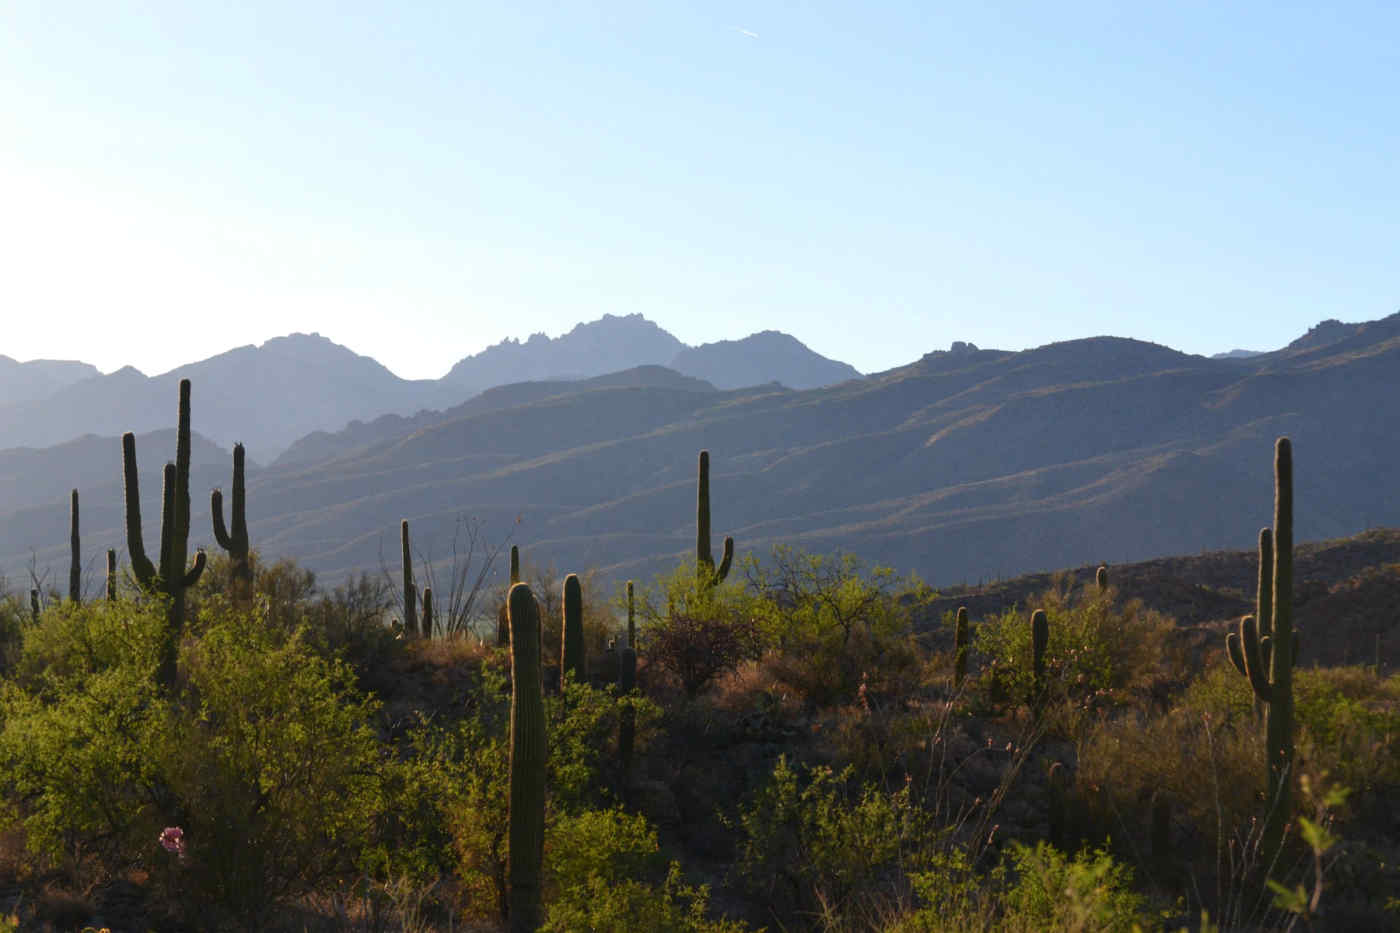 Saguaro Cacti in Mexico